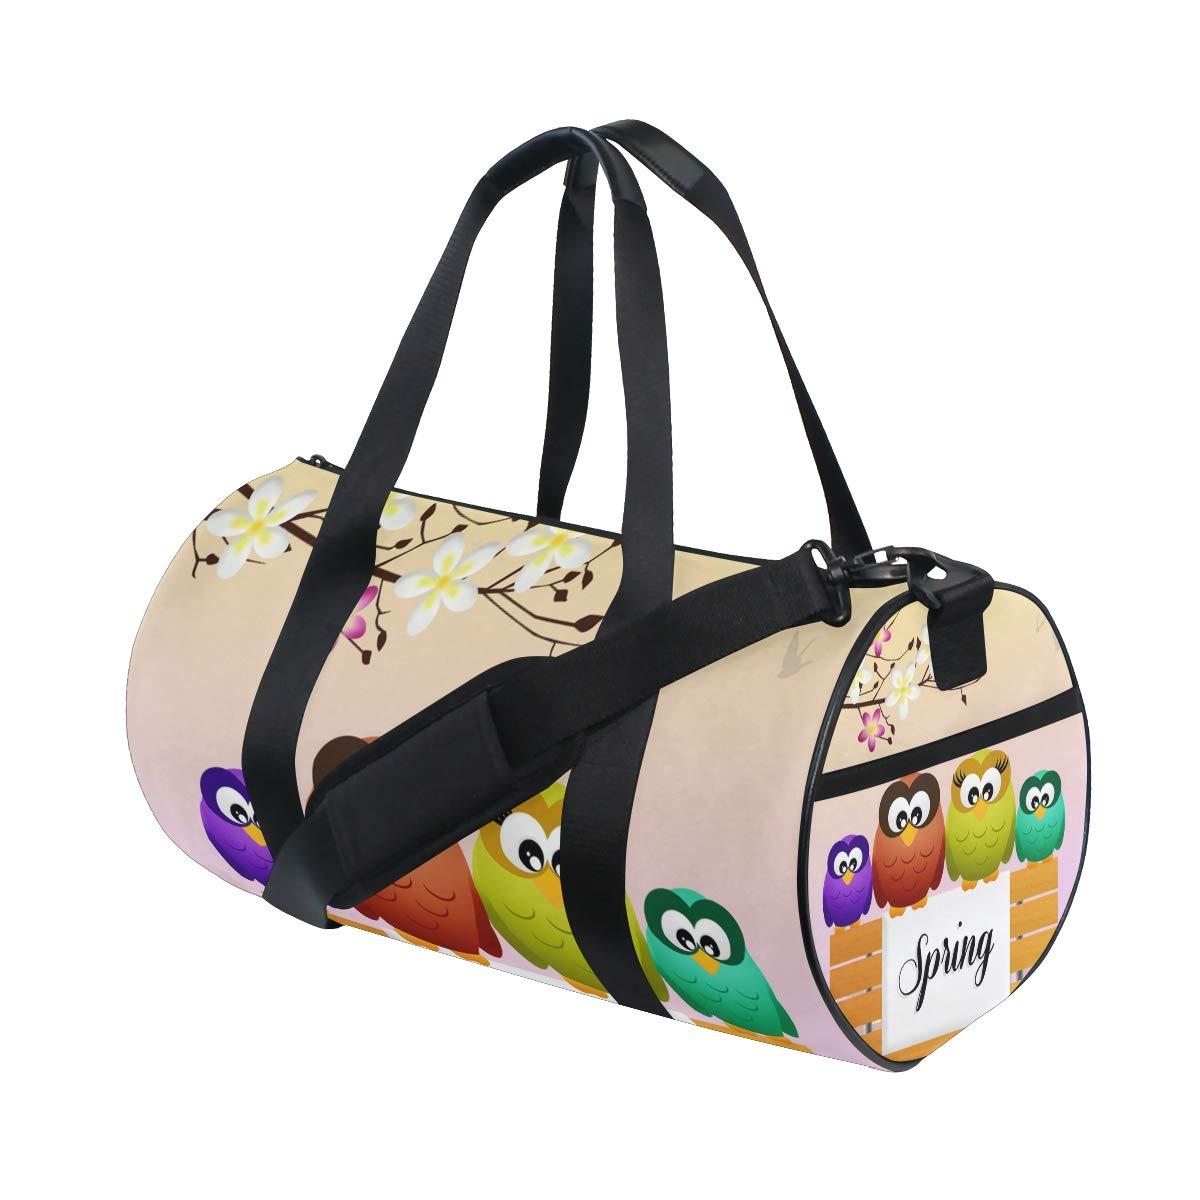 WIHVE Gym Duffel Bag Welcome Spring Cute Cartoon Owls Bench Sports Lightweight Canvas Travel Luggage Bag